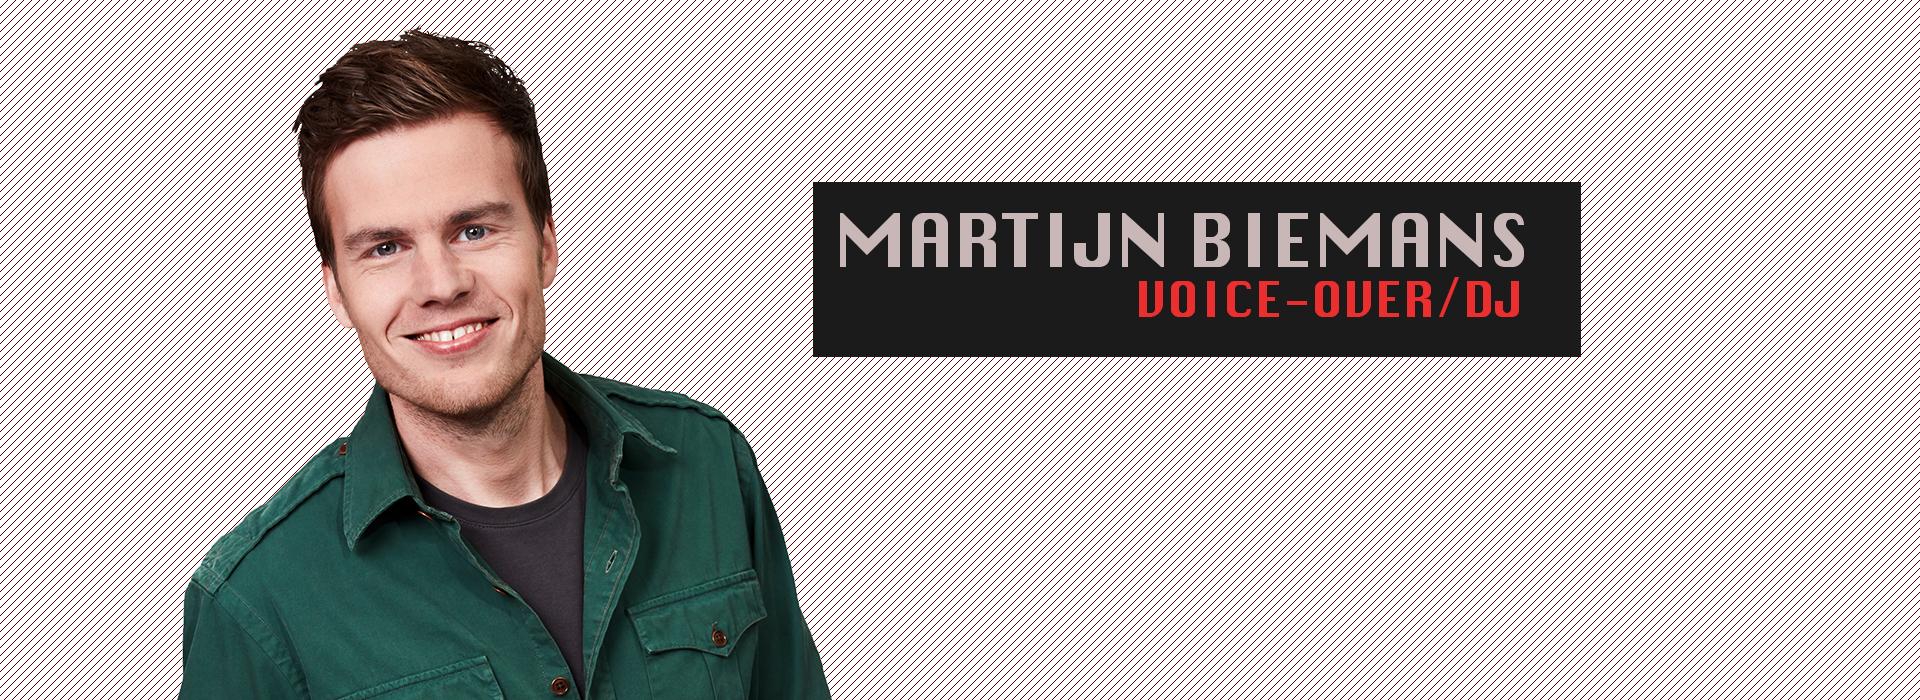 Martijn Biemans